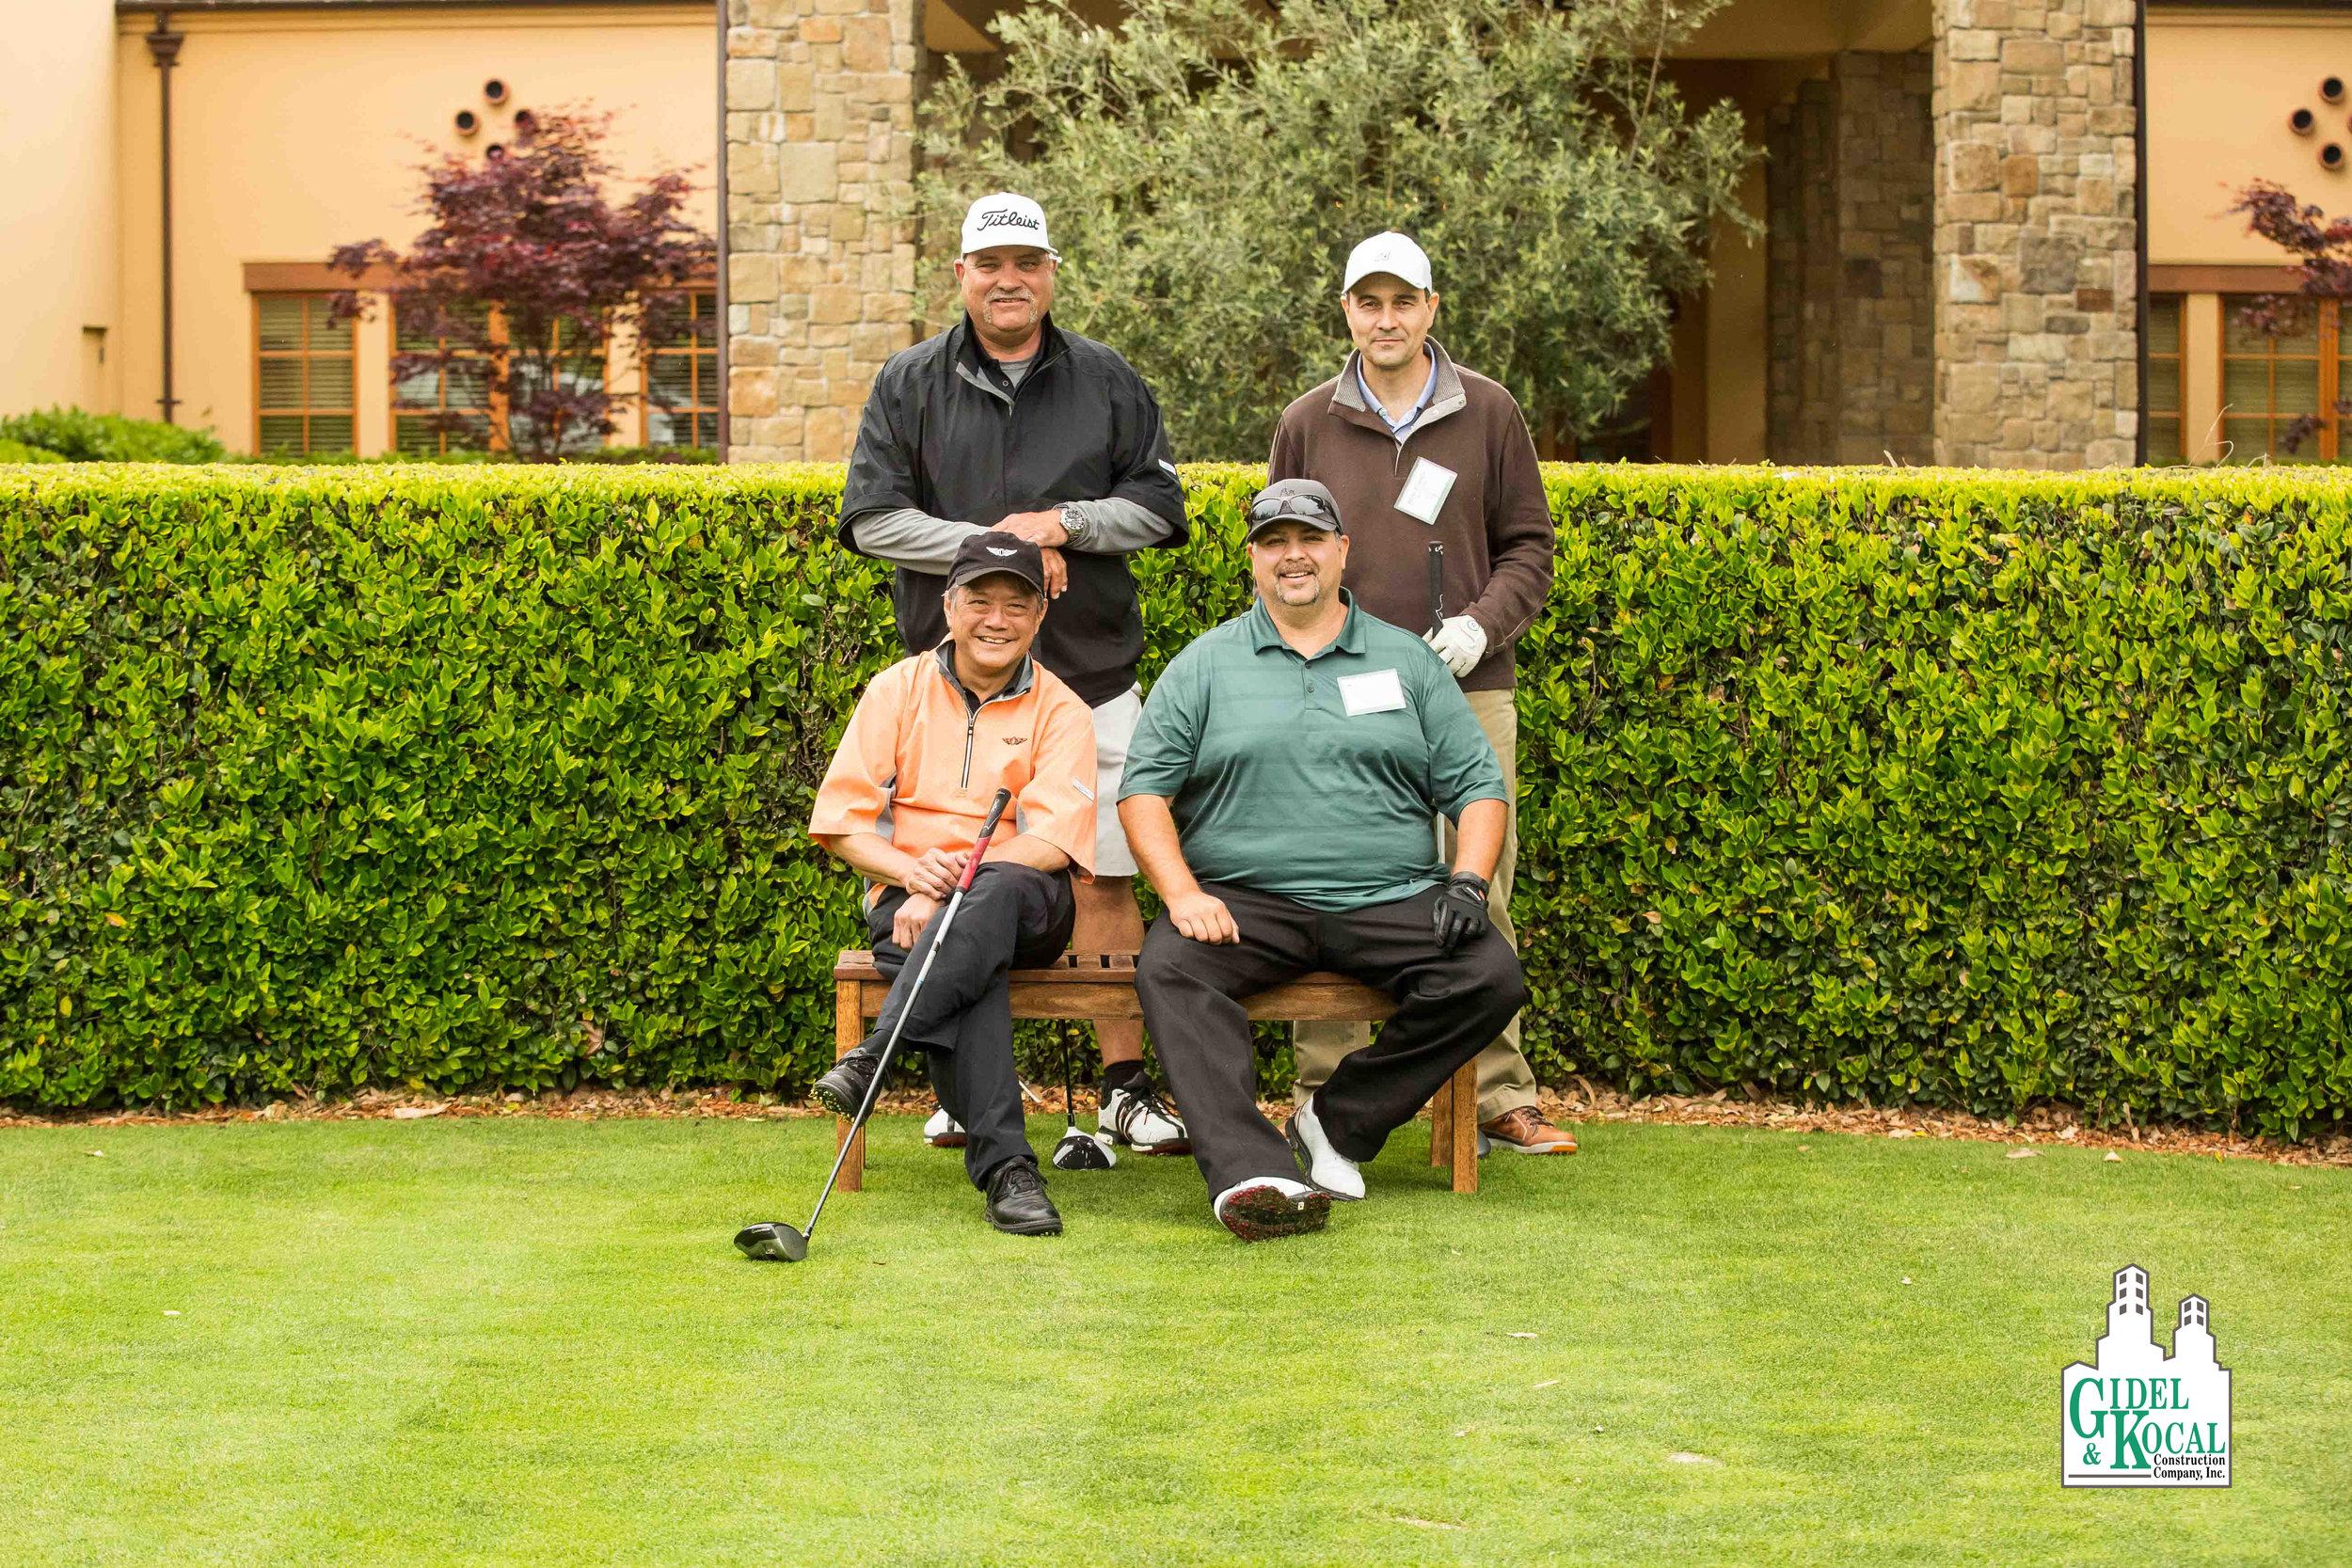 2017-04-17_GK_Golf_DBAPIX-310_LORES.jpg